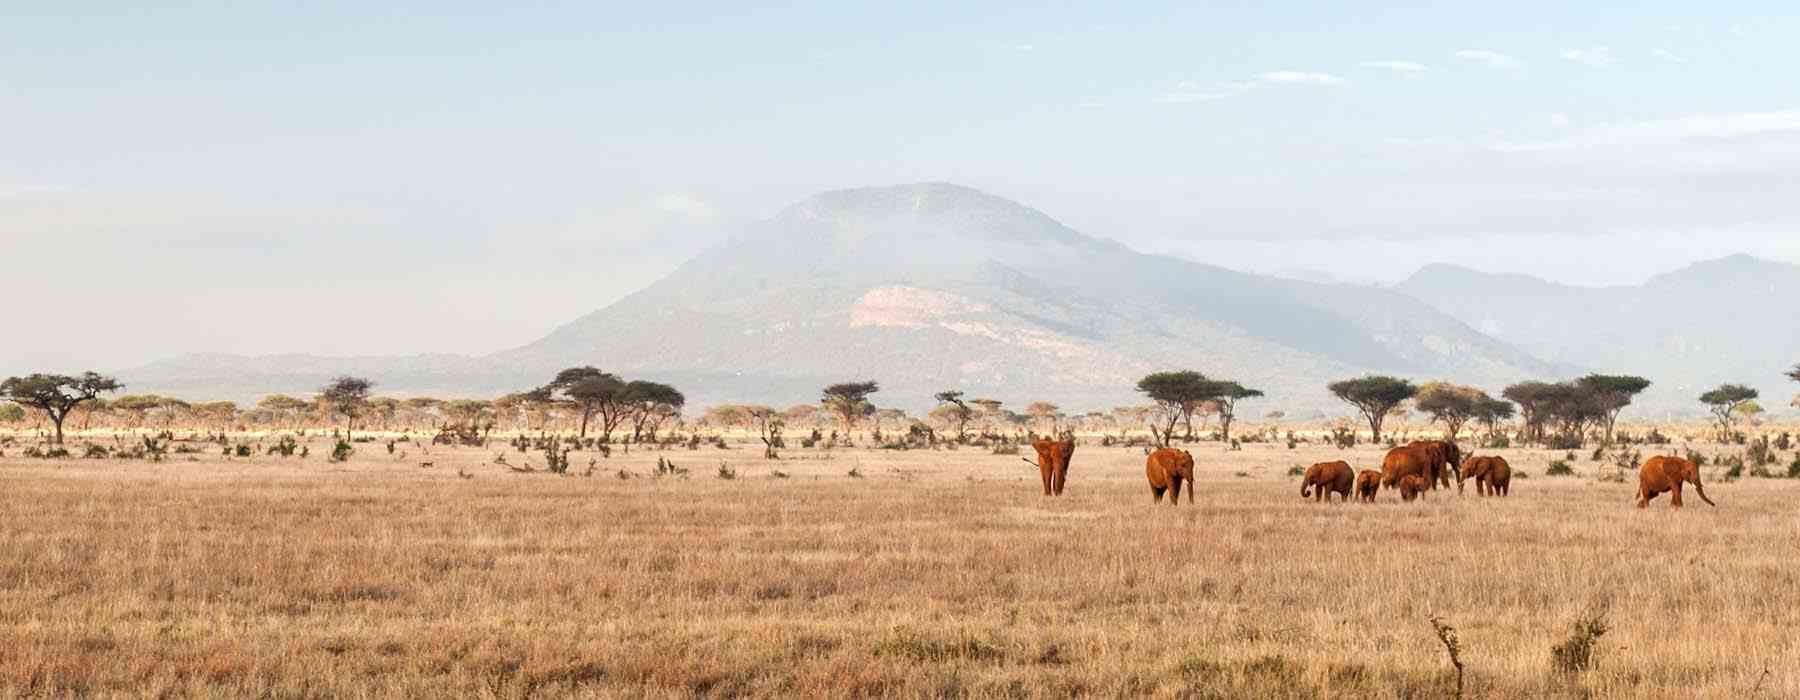 kenya une destination qui tient ses promesses